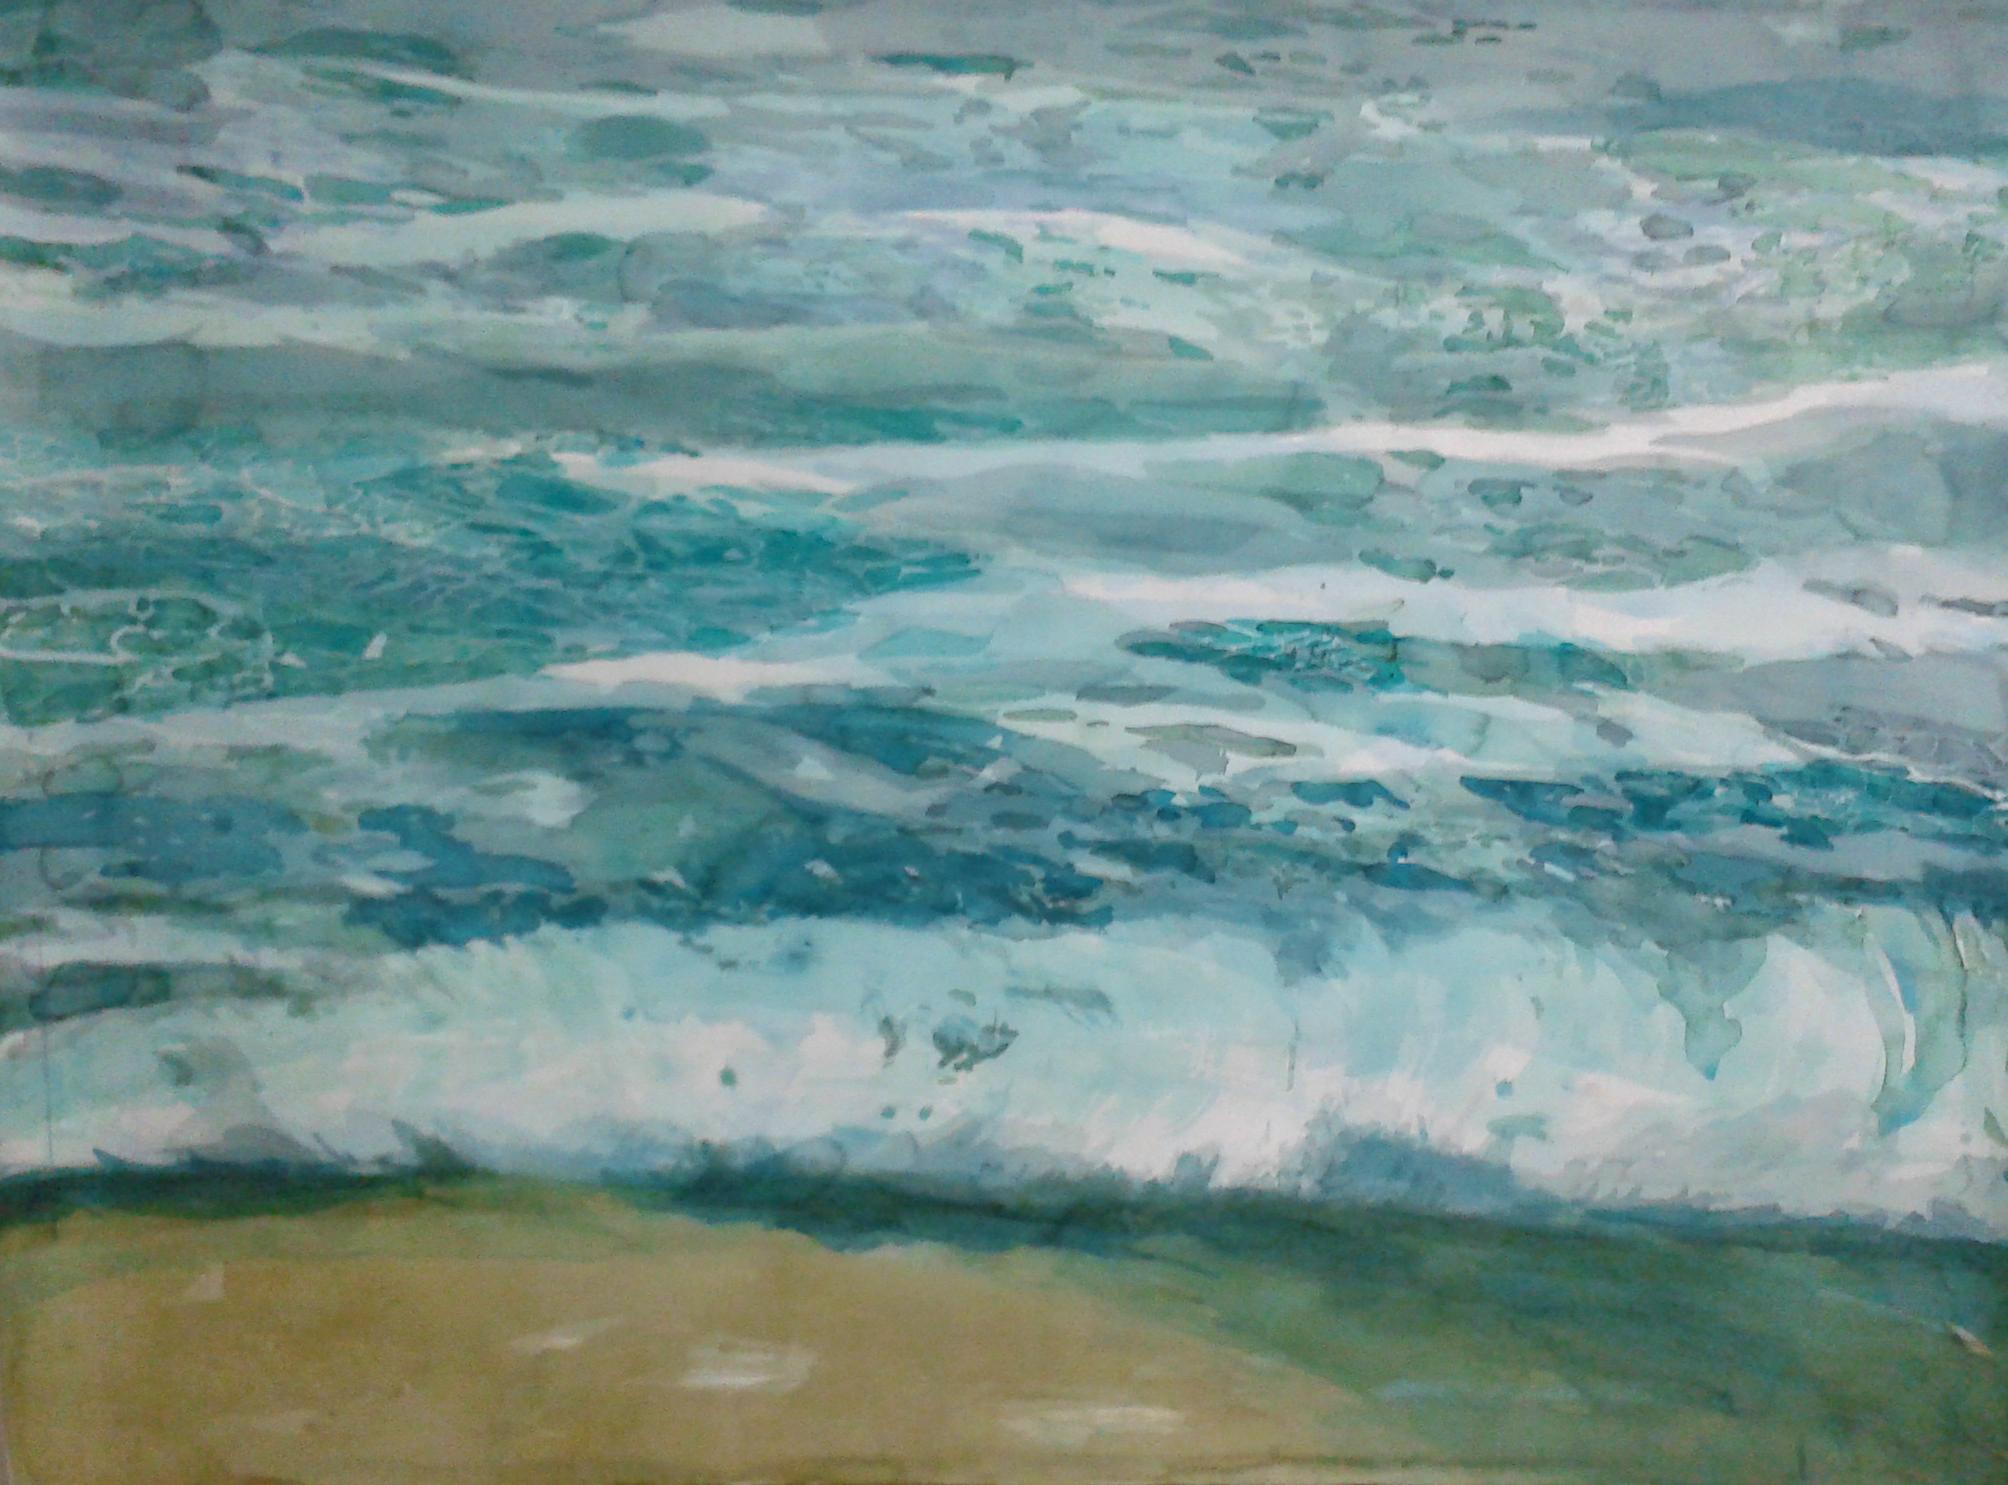 aquarela: mergulho n18